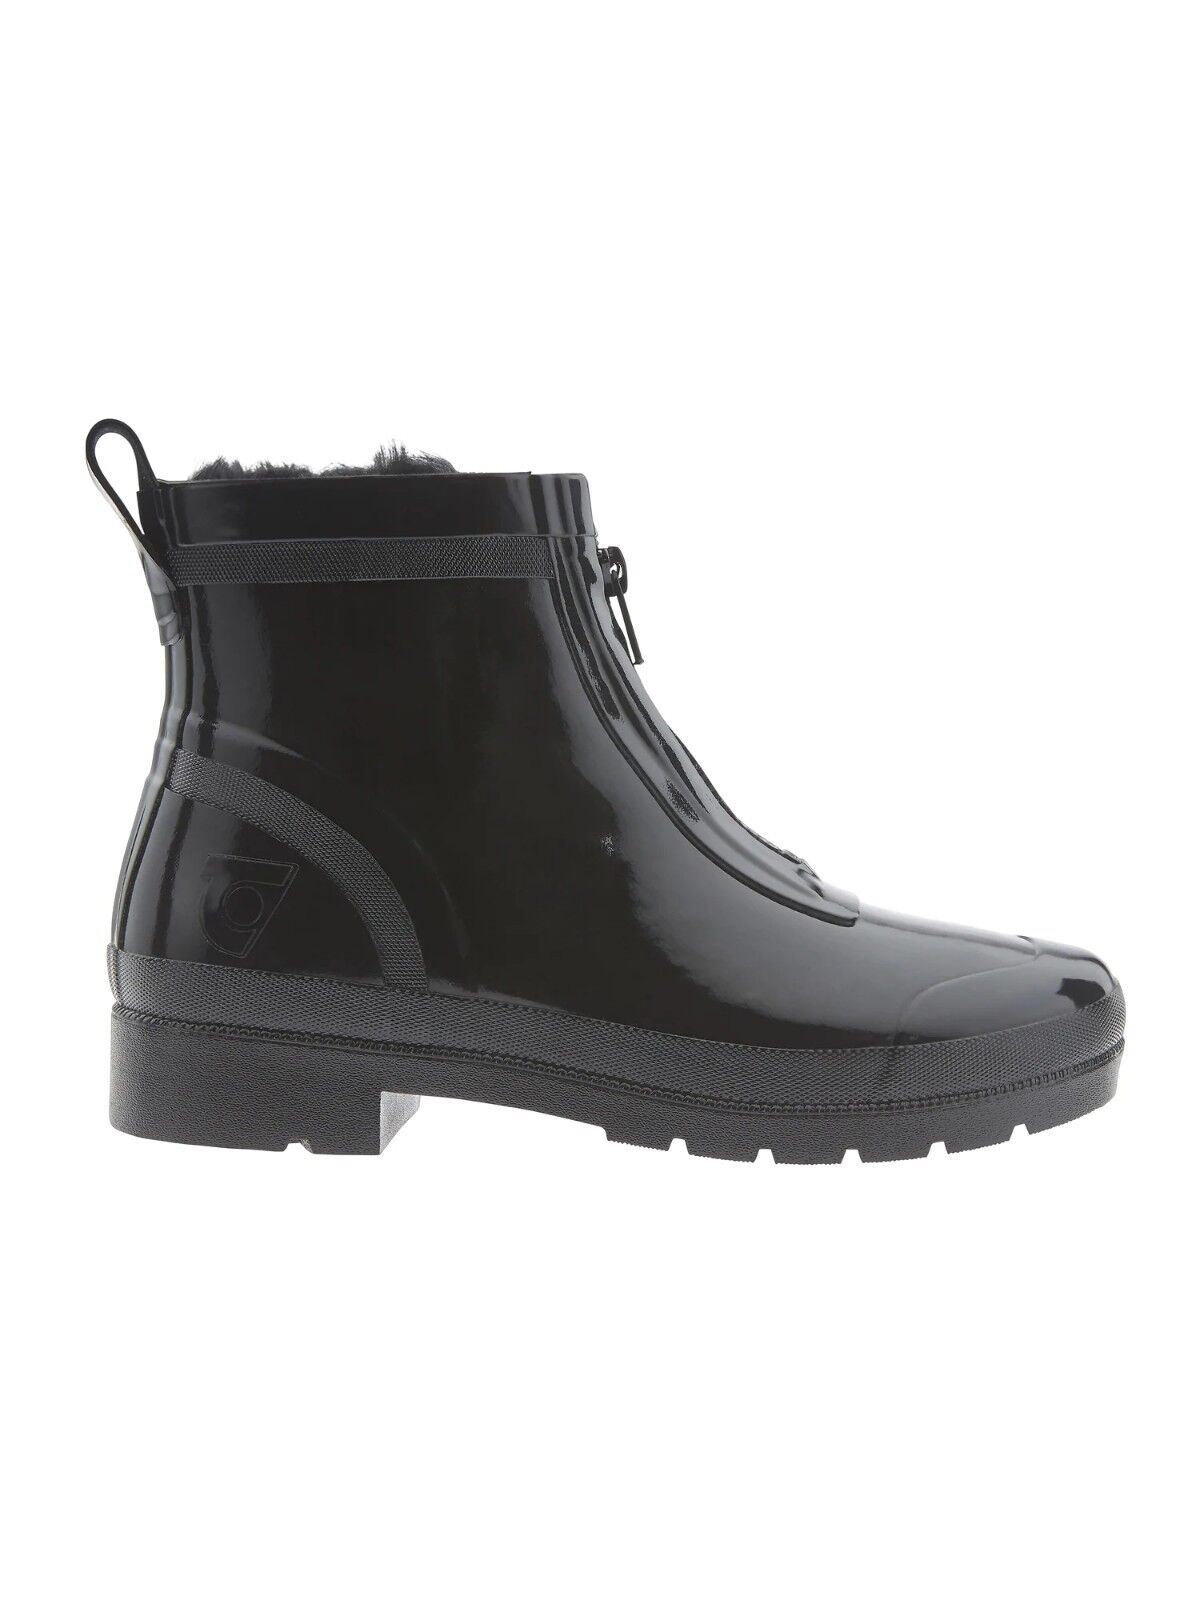 Athleta Lina Zip Short Shiny Rubber Rain Boot by Tretorn,Black SIZE 7 US (EU 38)